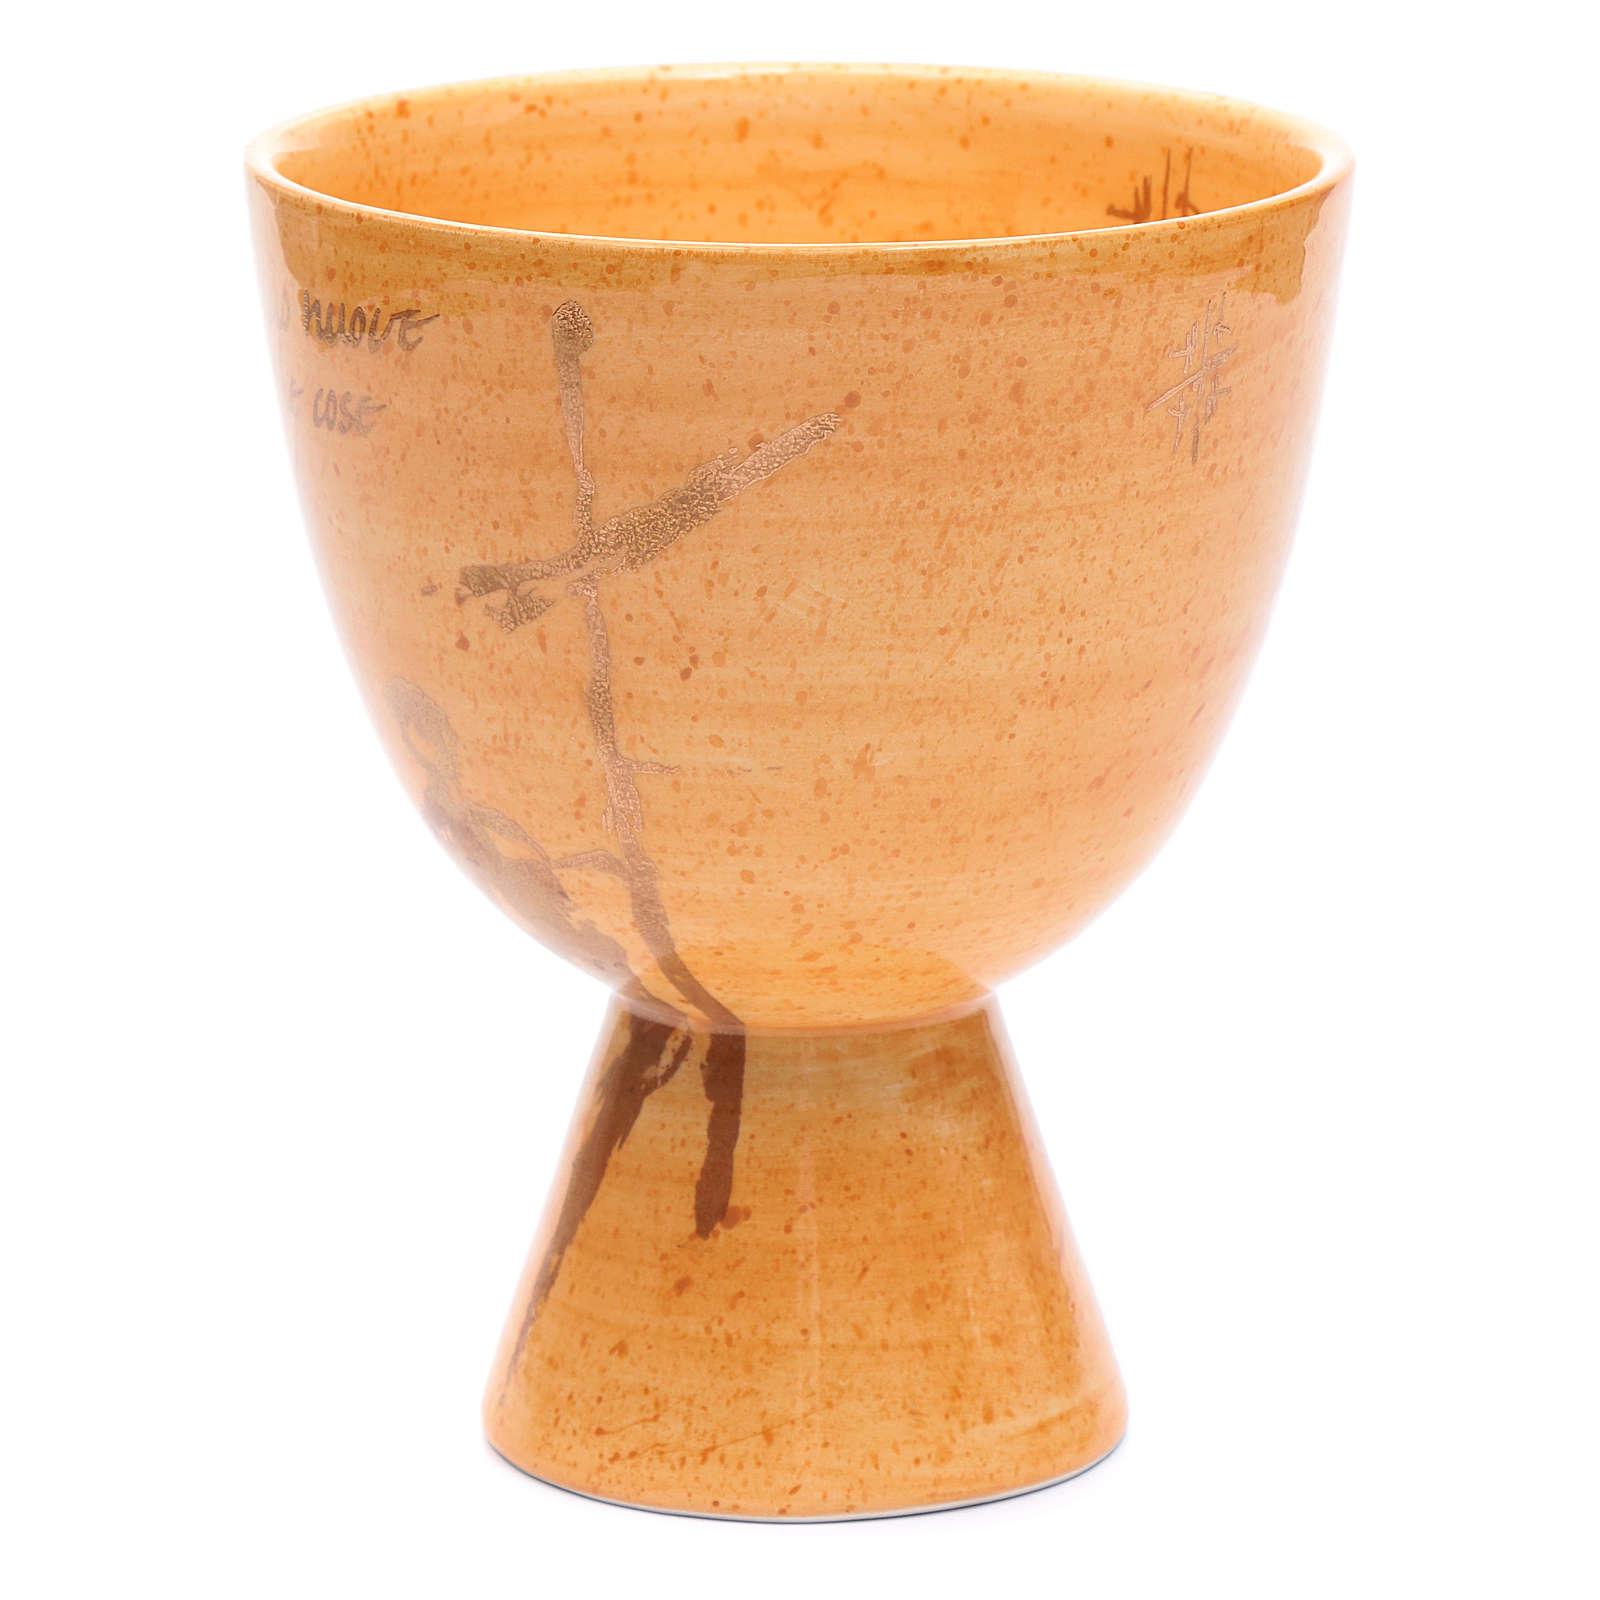 Calice céramique Coppa couleur moutarde 4